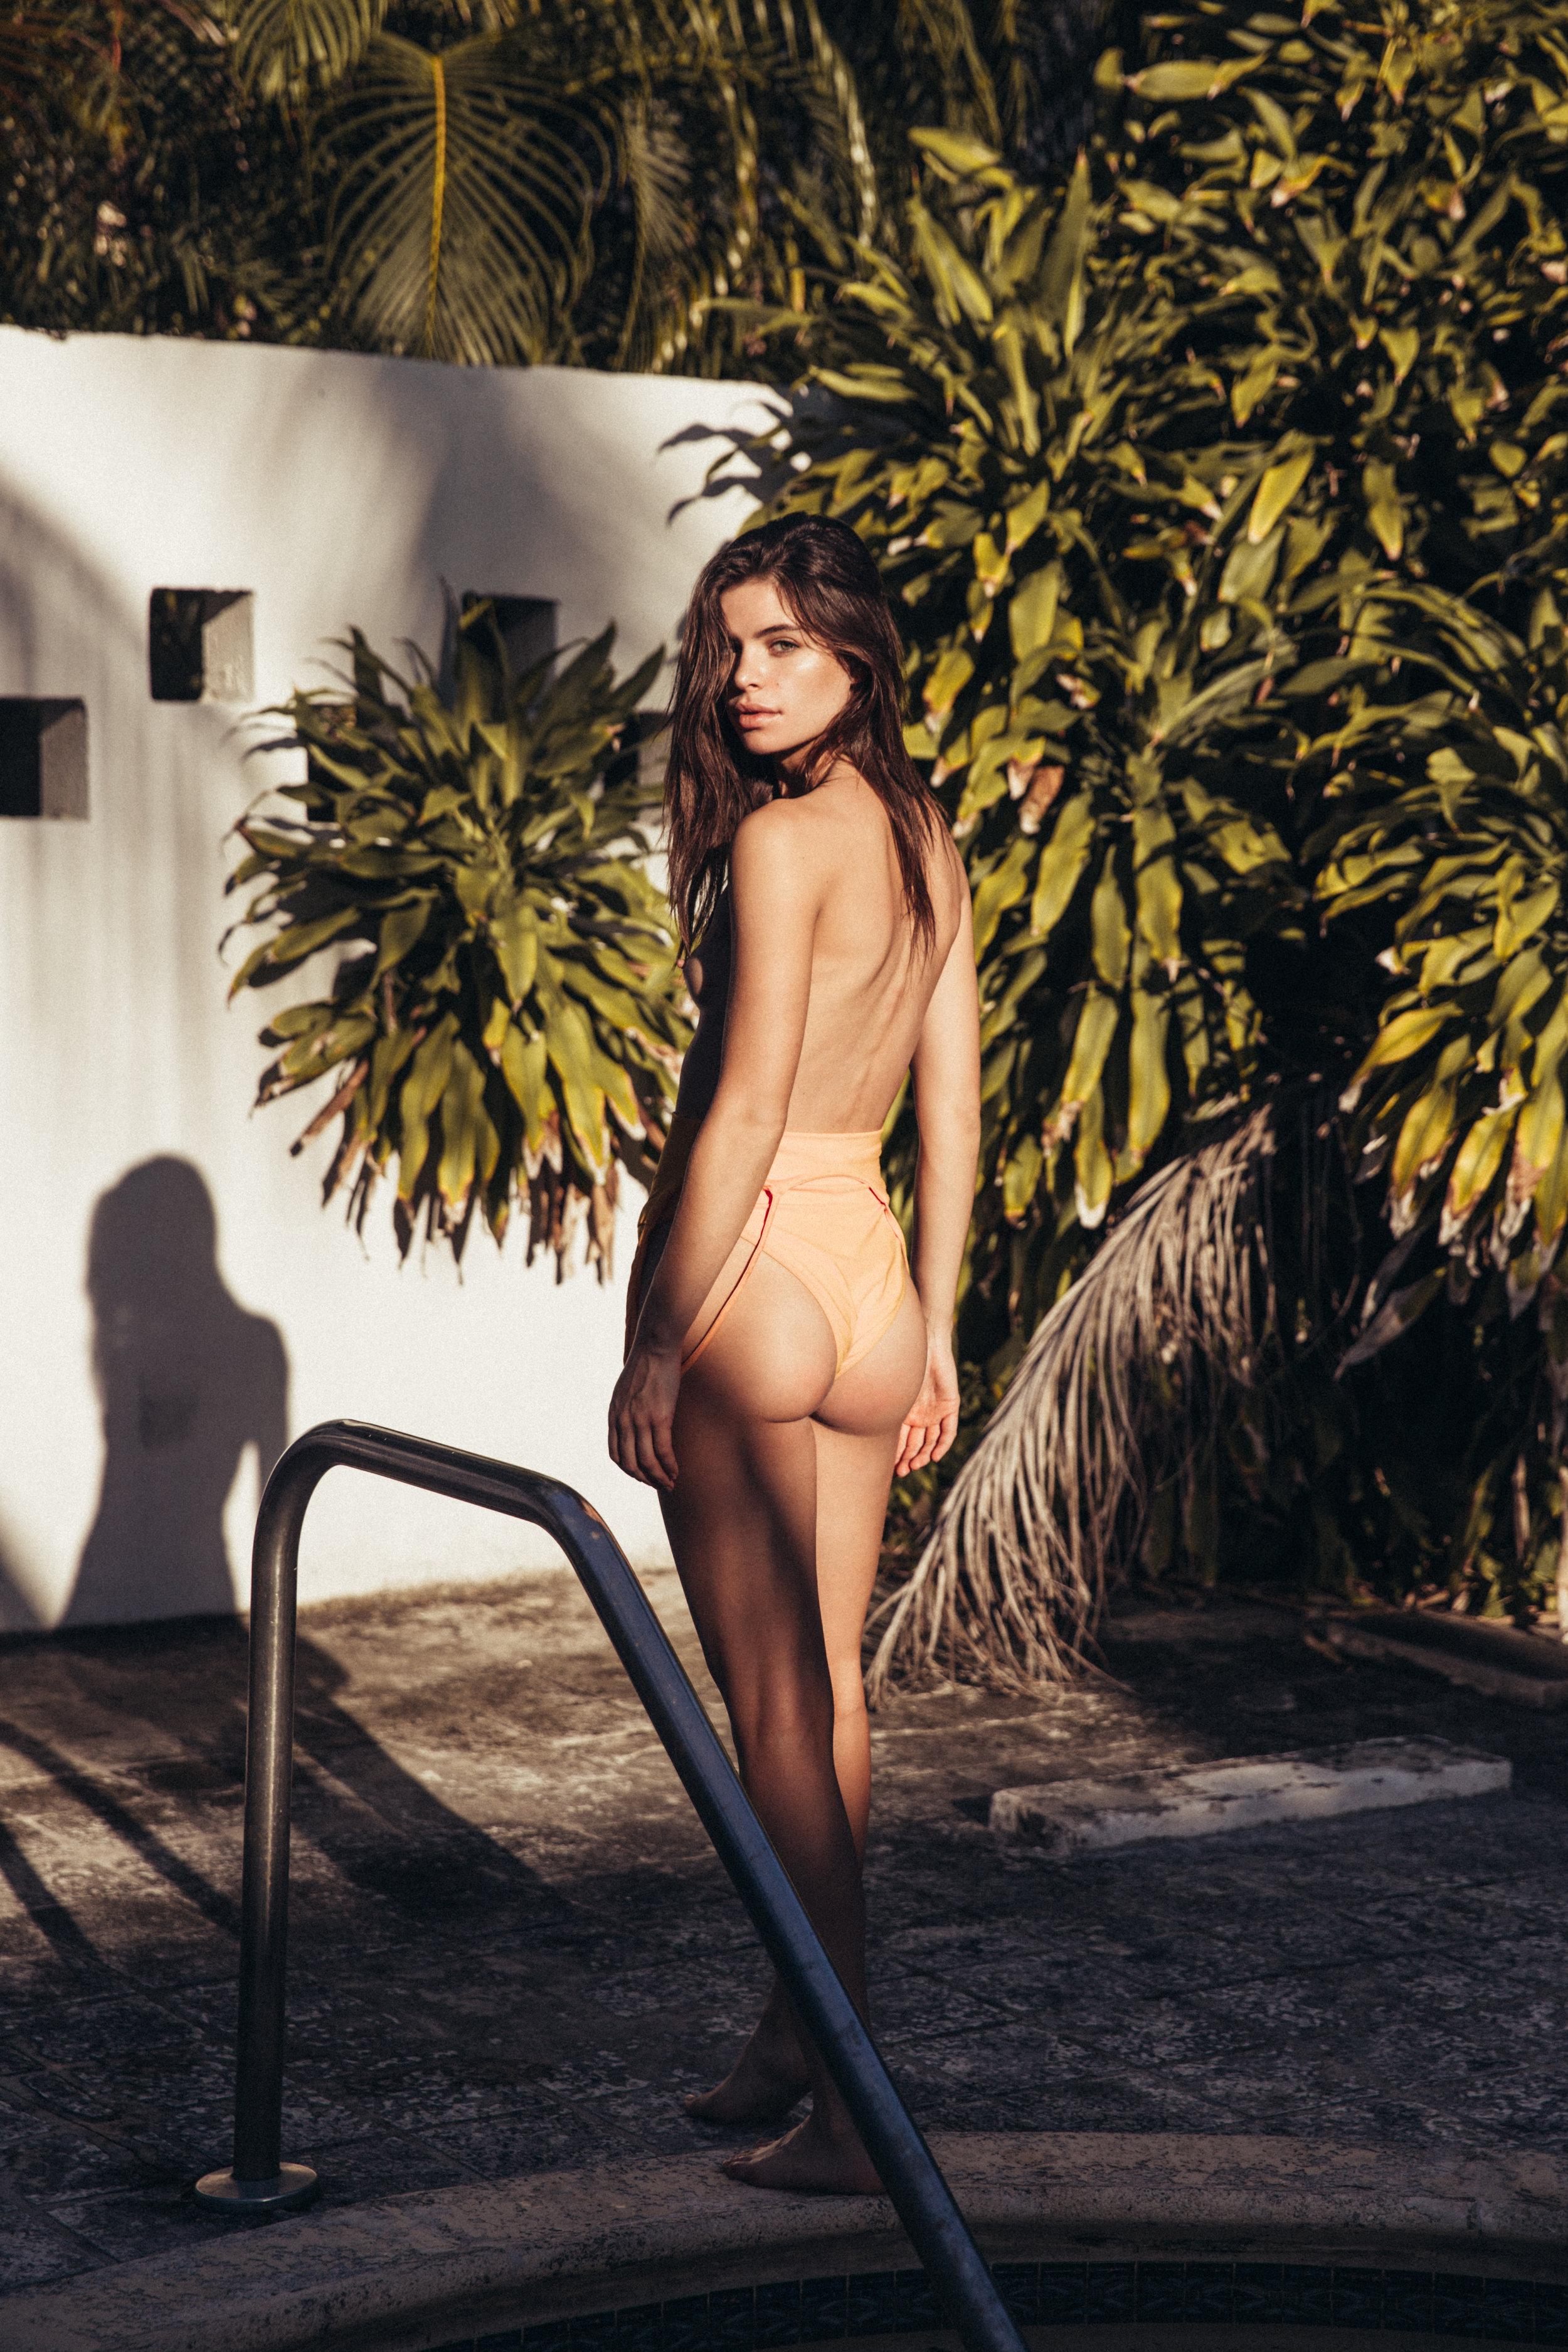 model becca lane vogue models fashion bikini swimwear spray tans by dila djokaj la sun airbrush